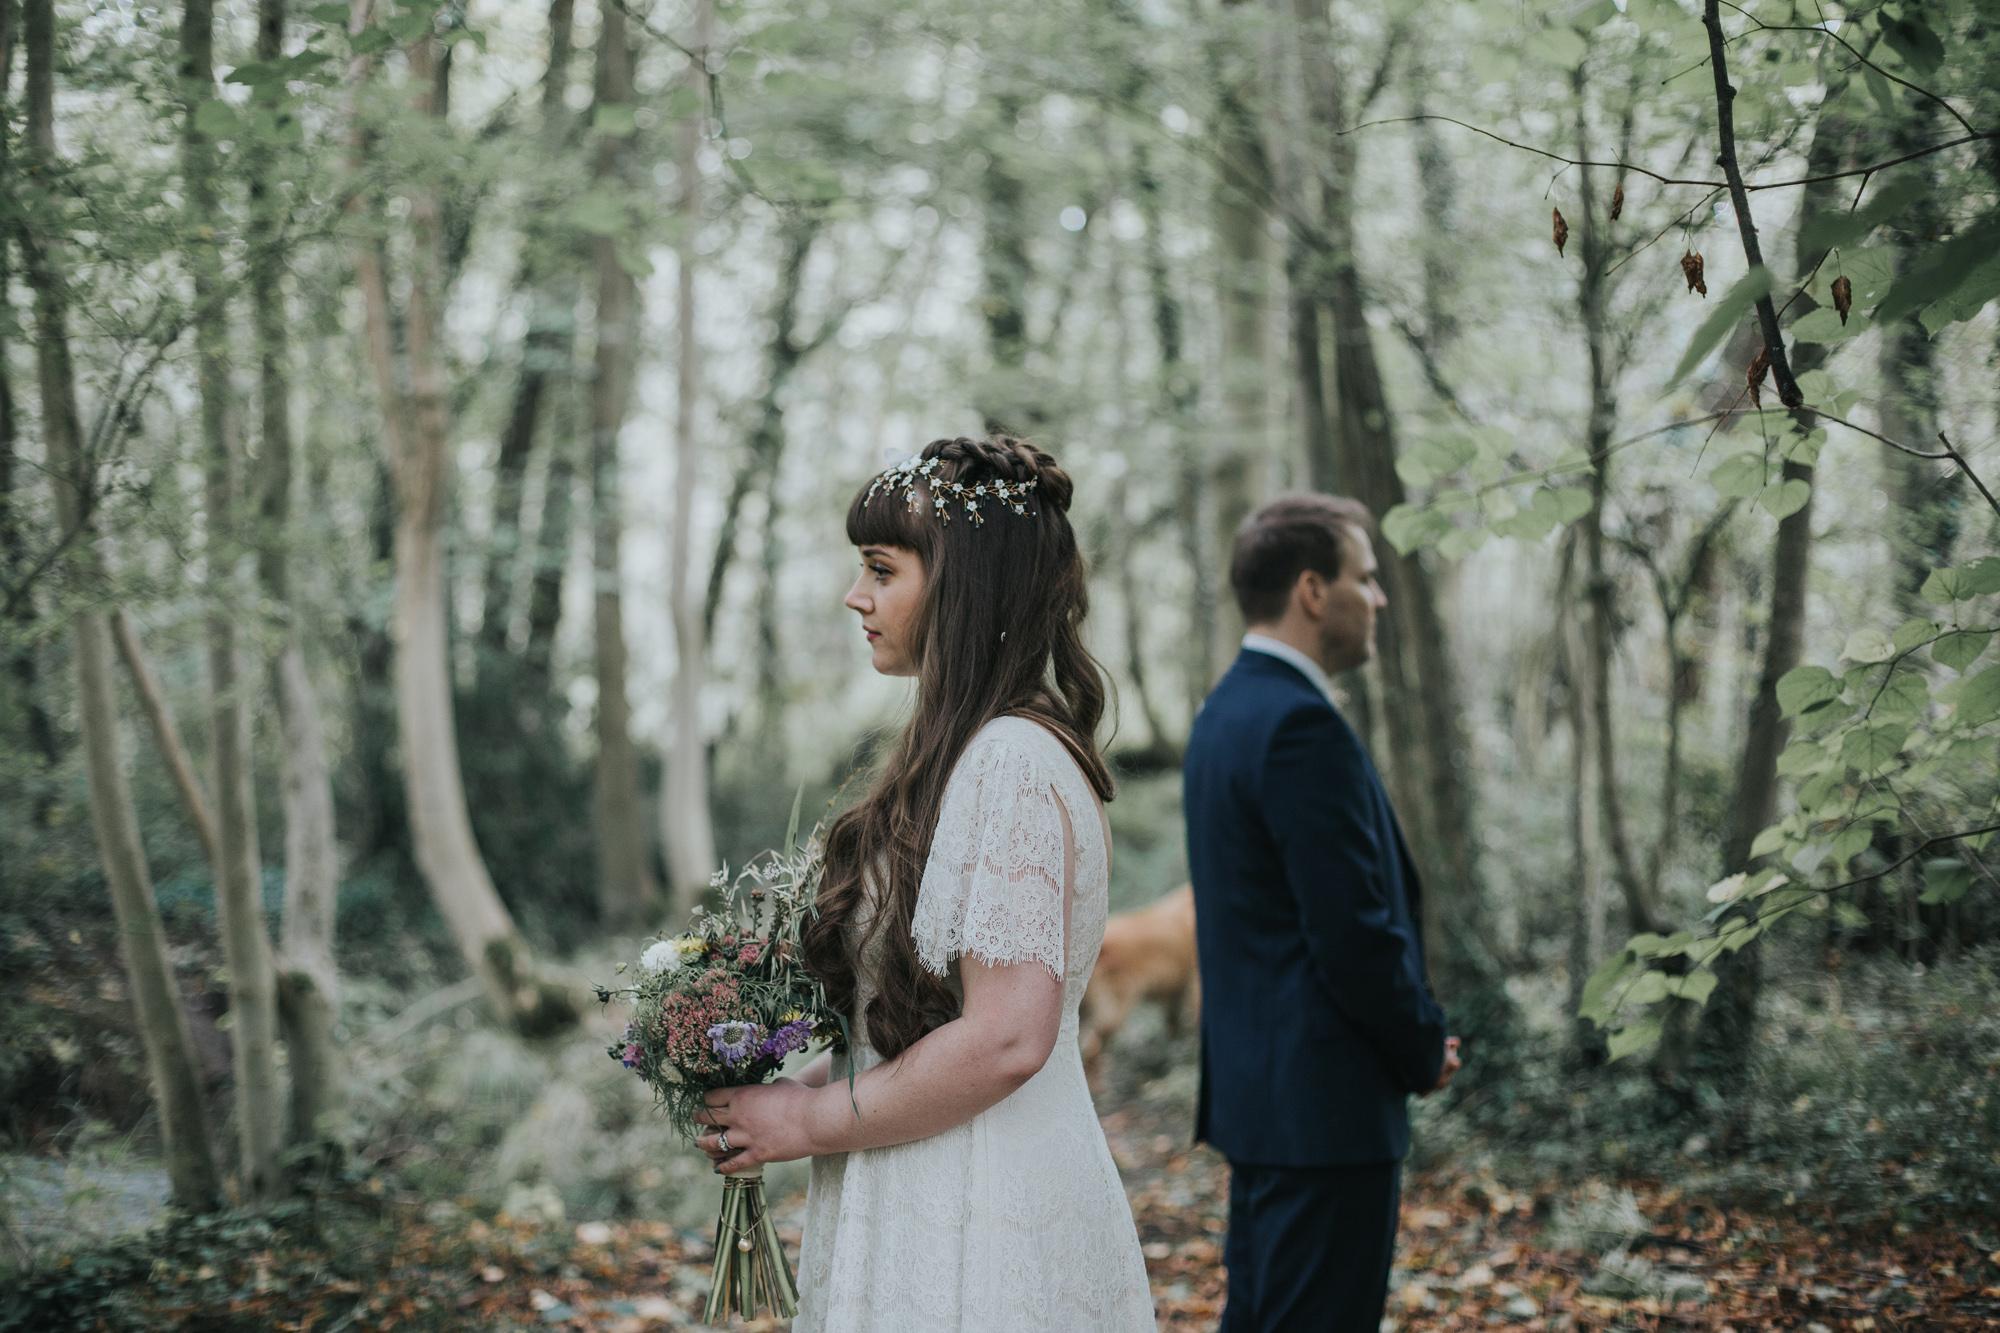 Kristy-Back-Garden-Outdoor-Wedding-Sheffield-Industrial-Warehouse-Wedding-Bohemian-Kate-Beaumont-Dahlia-Dress-25.jpg